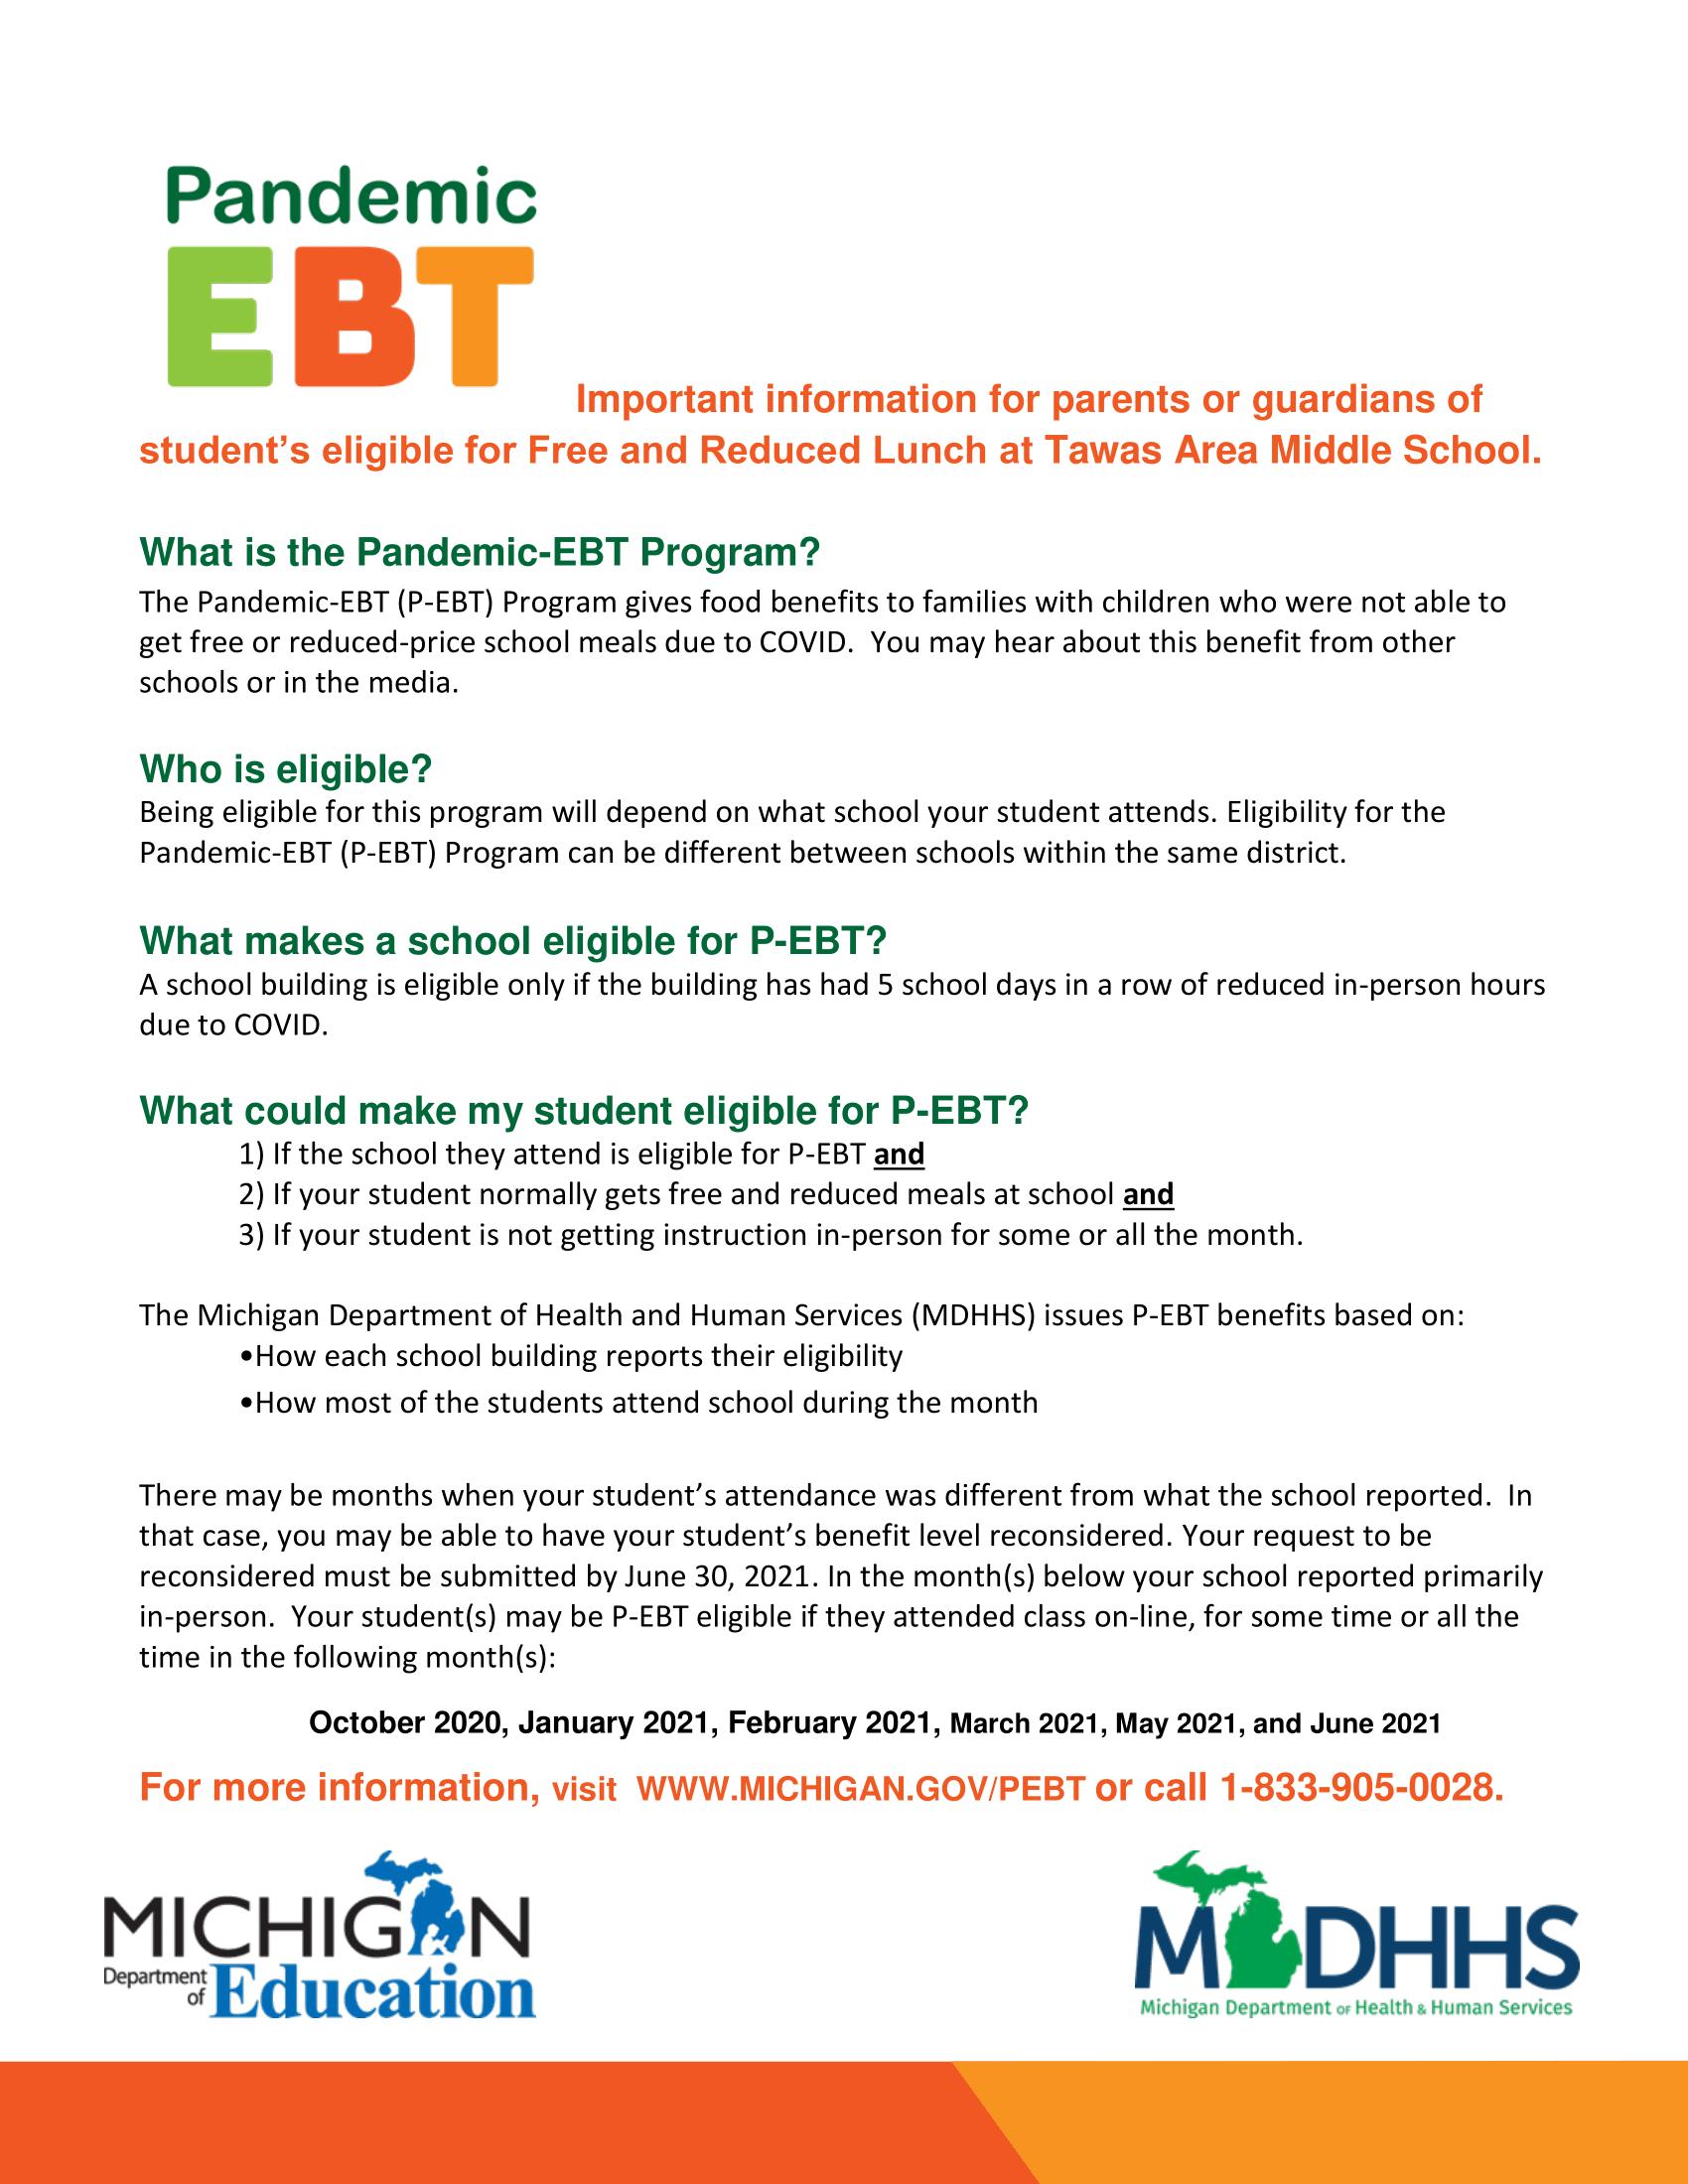 Pandemic-ebt information